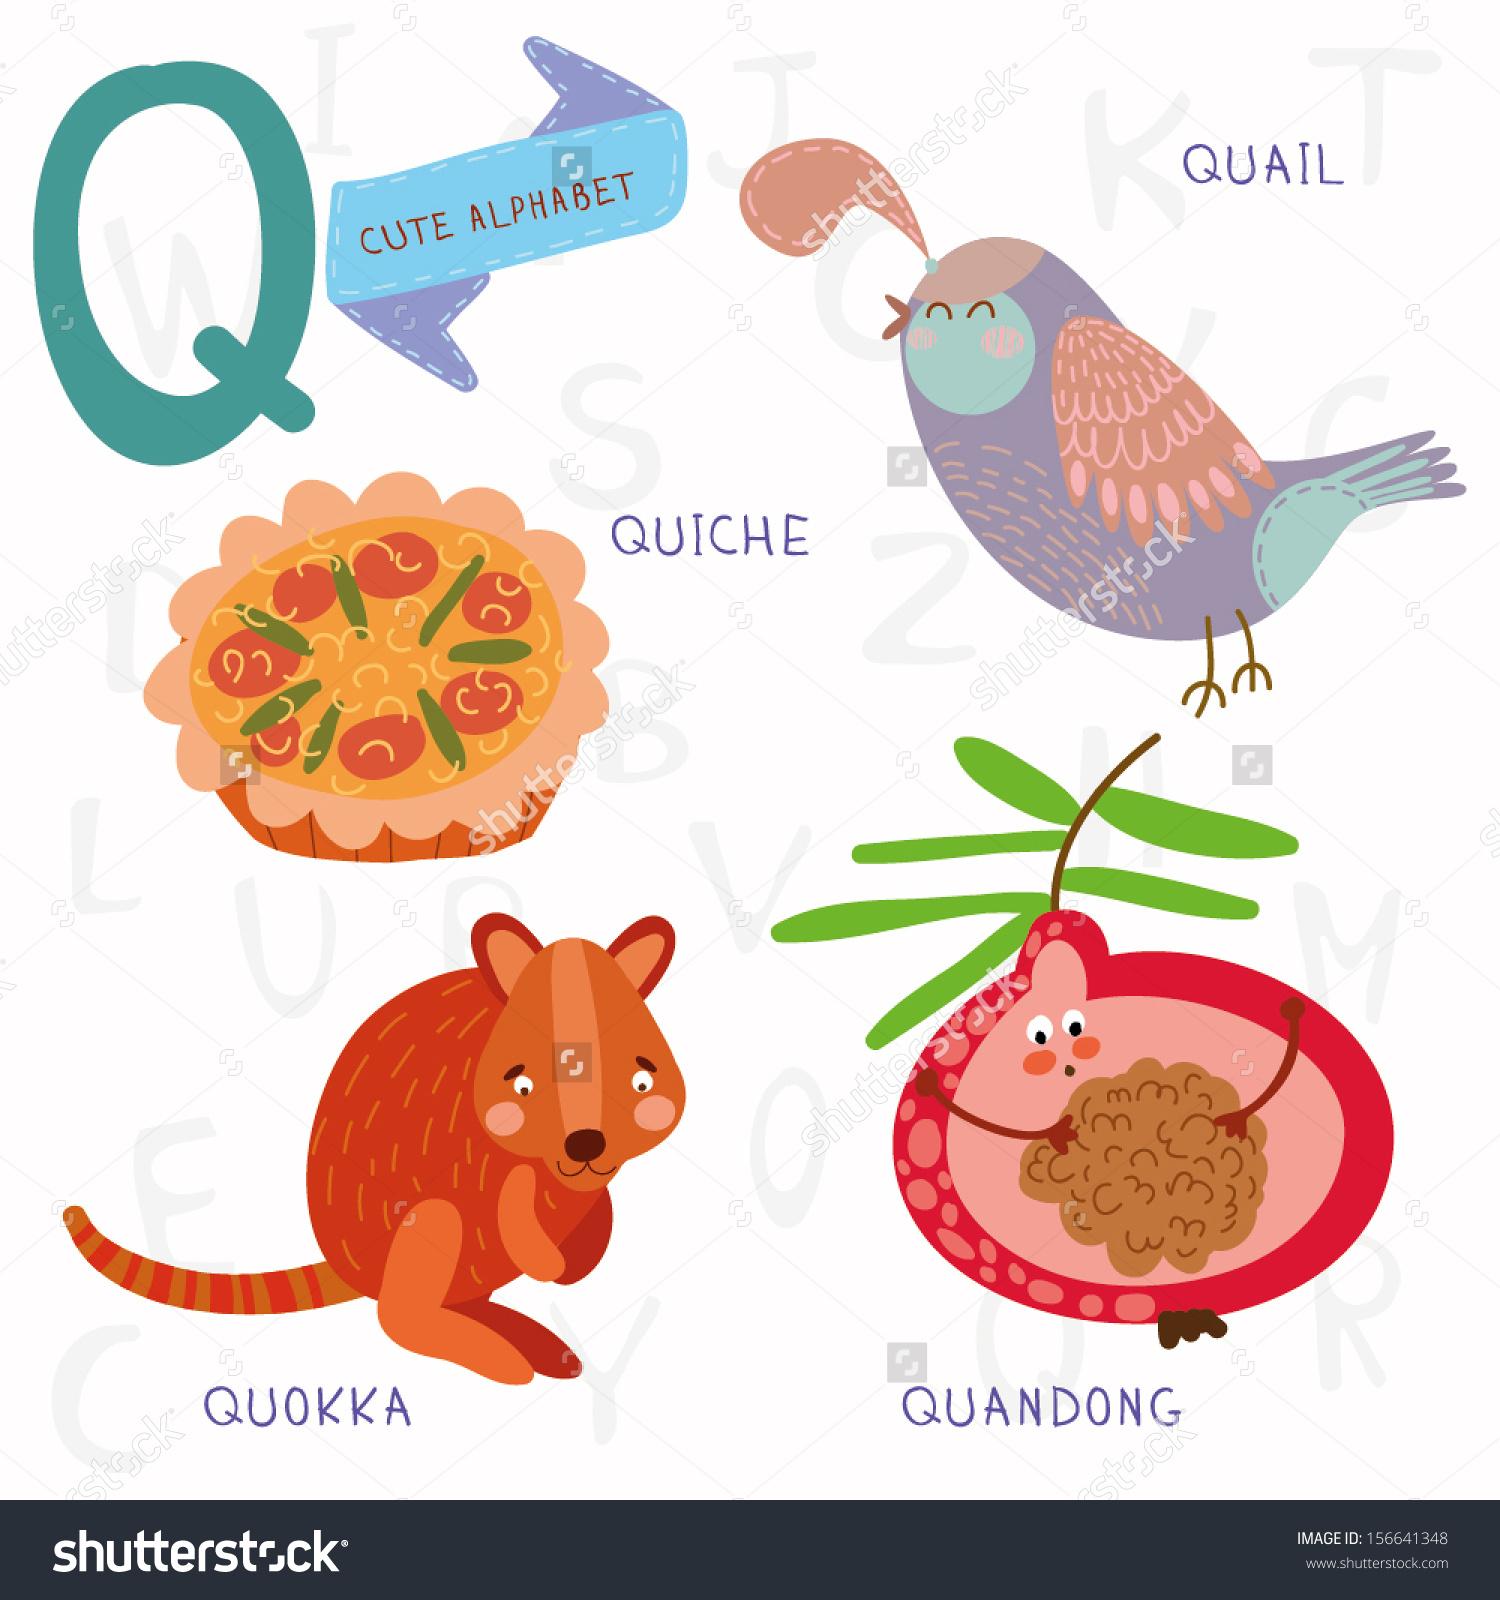 Very Cute Alphabet Q Letter Quokkaquichequandongquail Stock Vector.